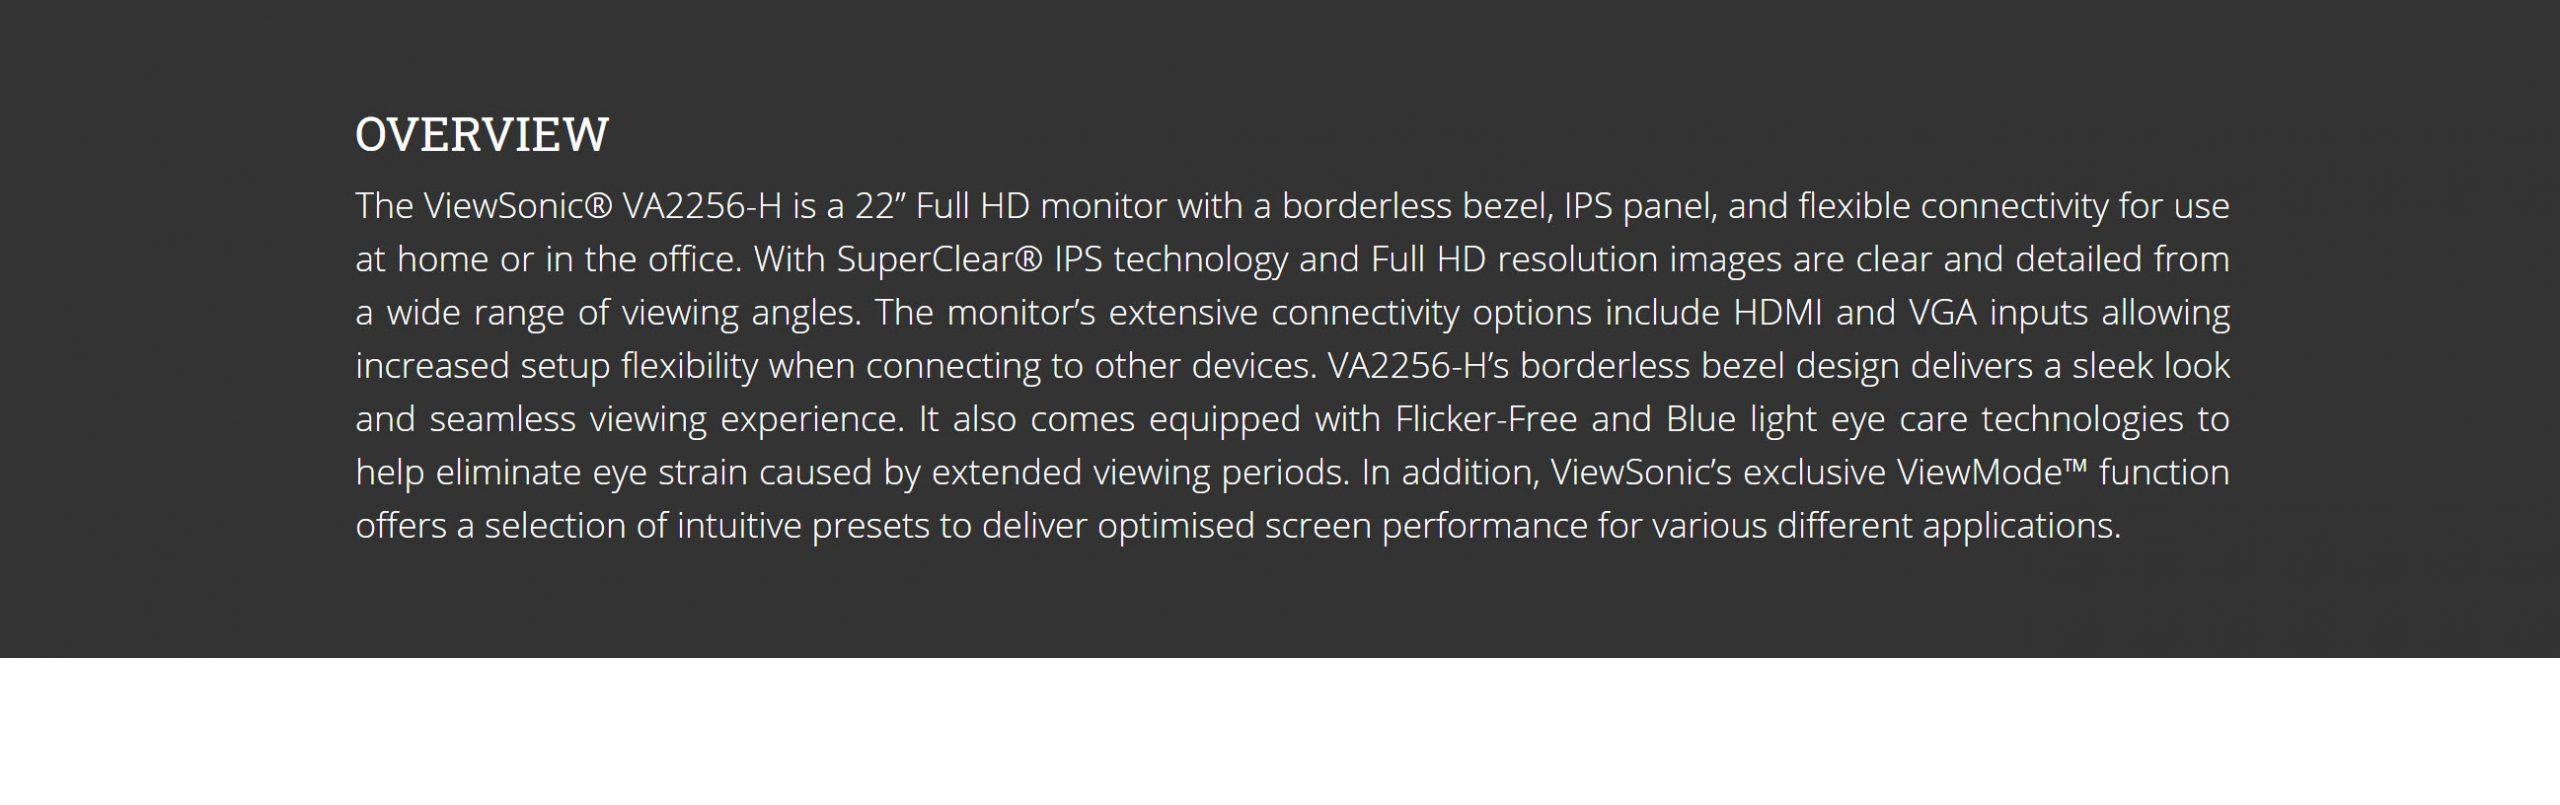 ViewSonic VA2256-H 22″ 1080p Home and Office Monitor – New